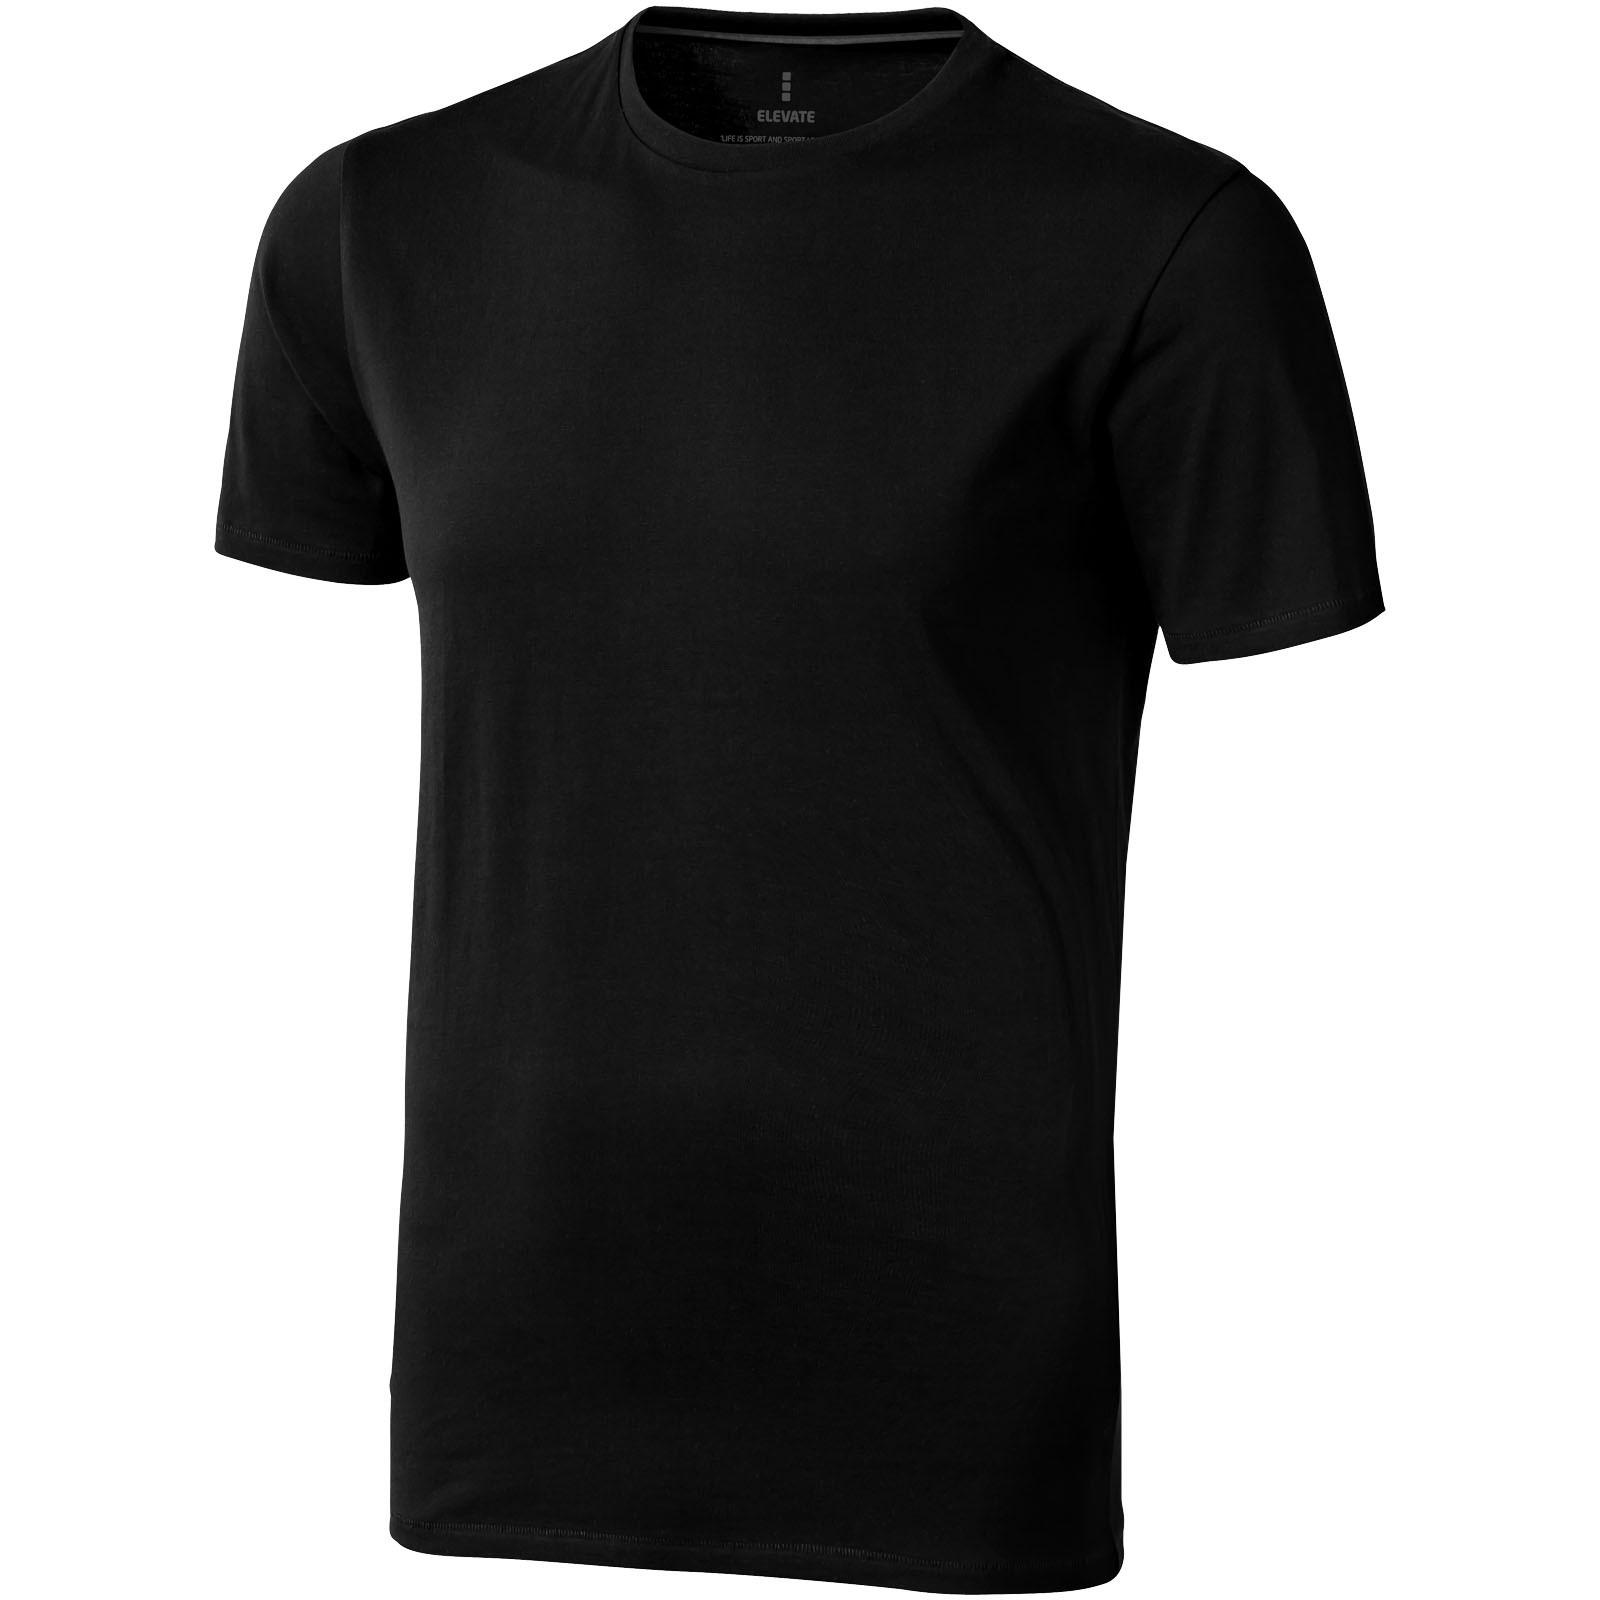 Nanaimo short sleeve men's t-shirt - Solid black / XXL